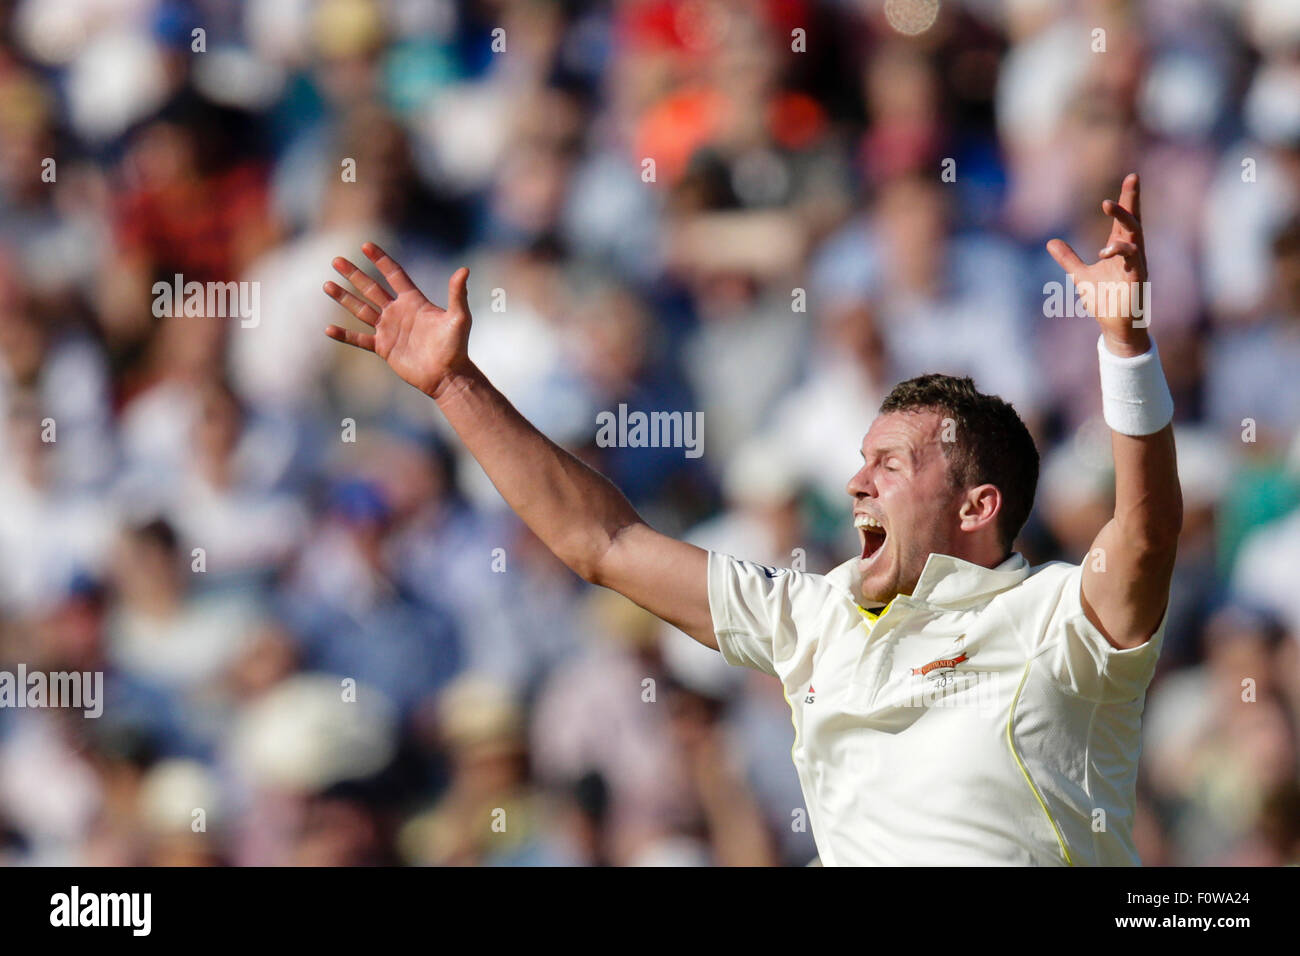 London, UK. 21. August 2015. Investec Asche 5. Test, Tag 2. England gegen Australien. Australiens Peter Siddle Appelle Stockbild